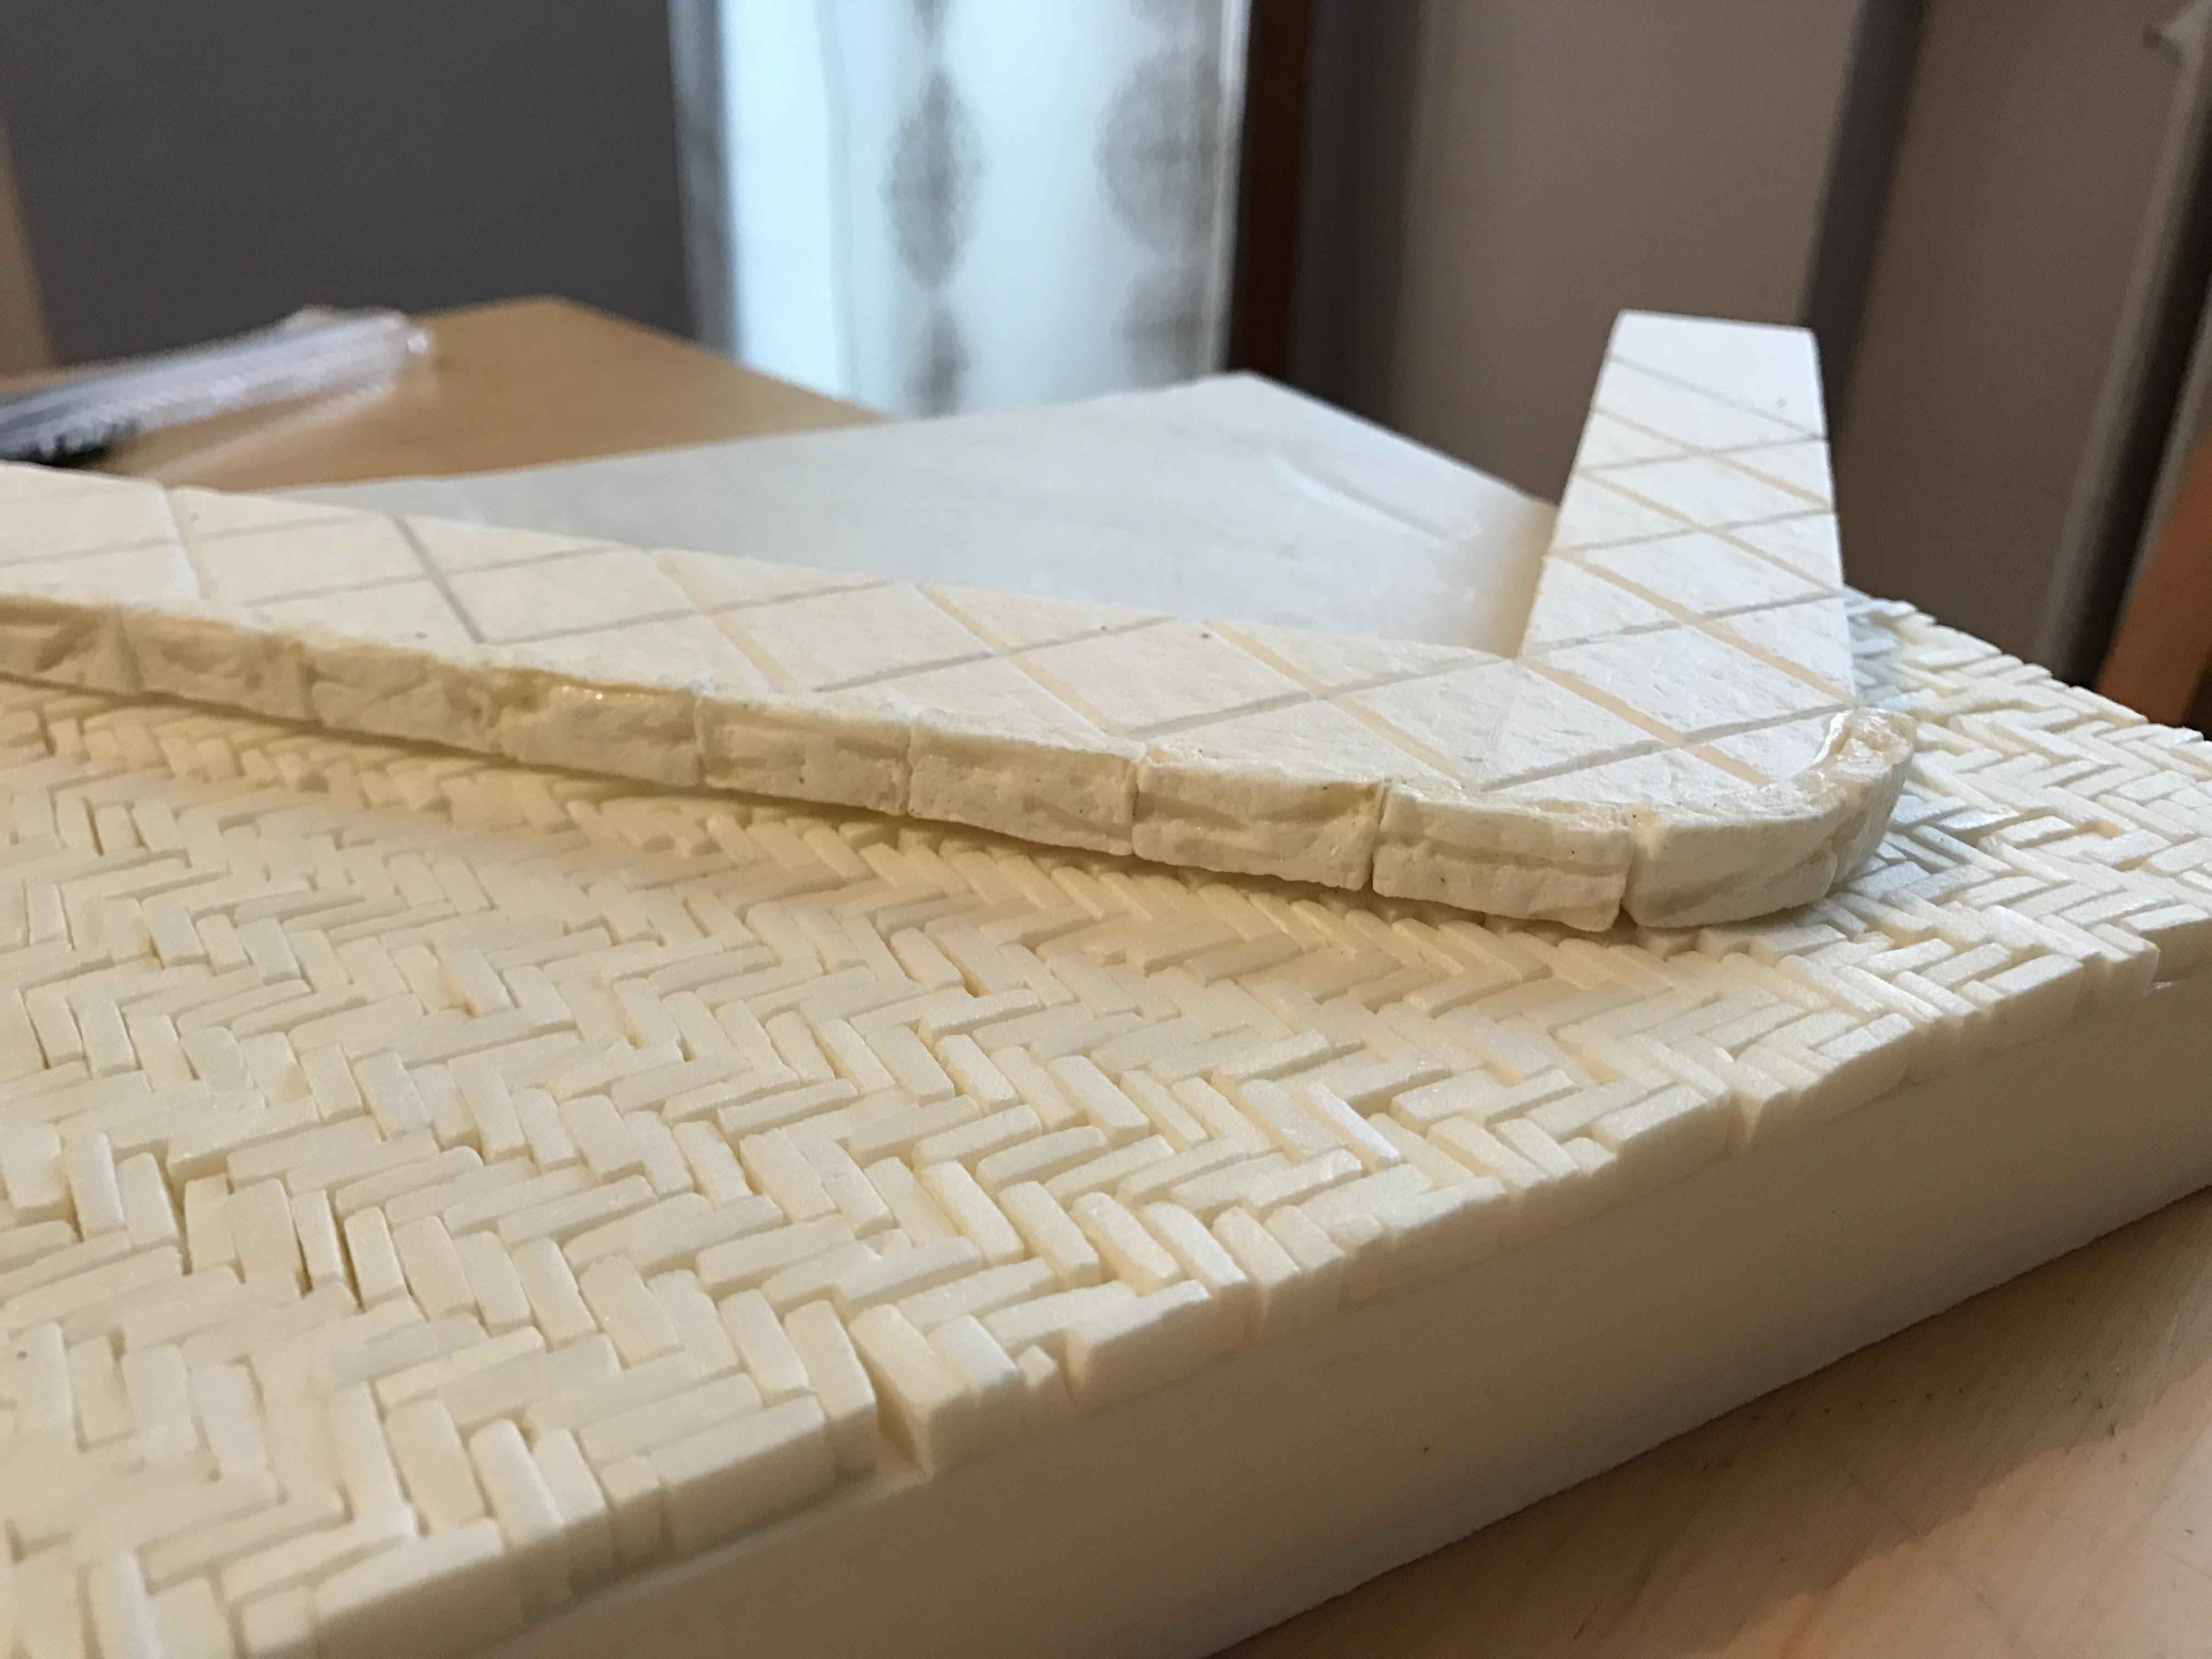 Gringotts - Tutorial costruzione di un diorama in urban style